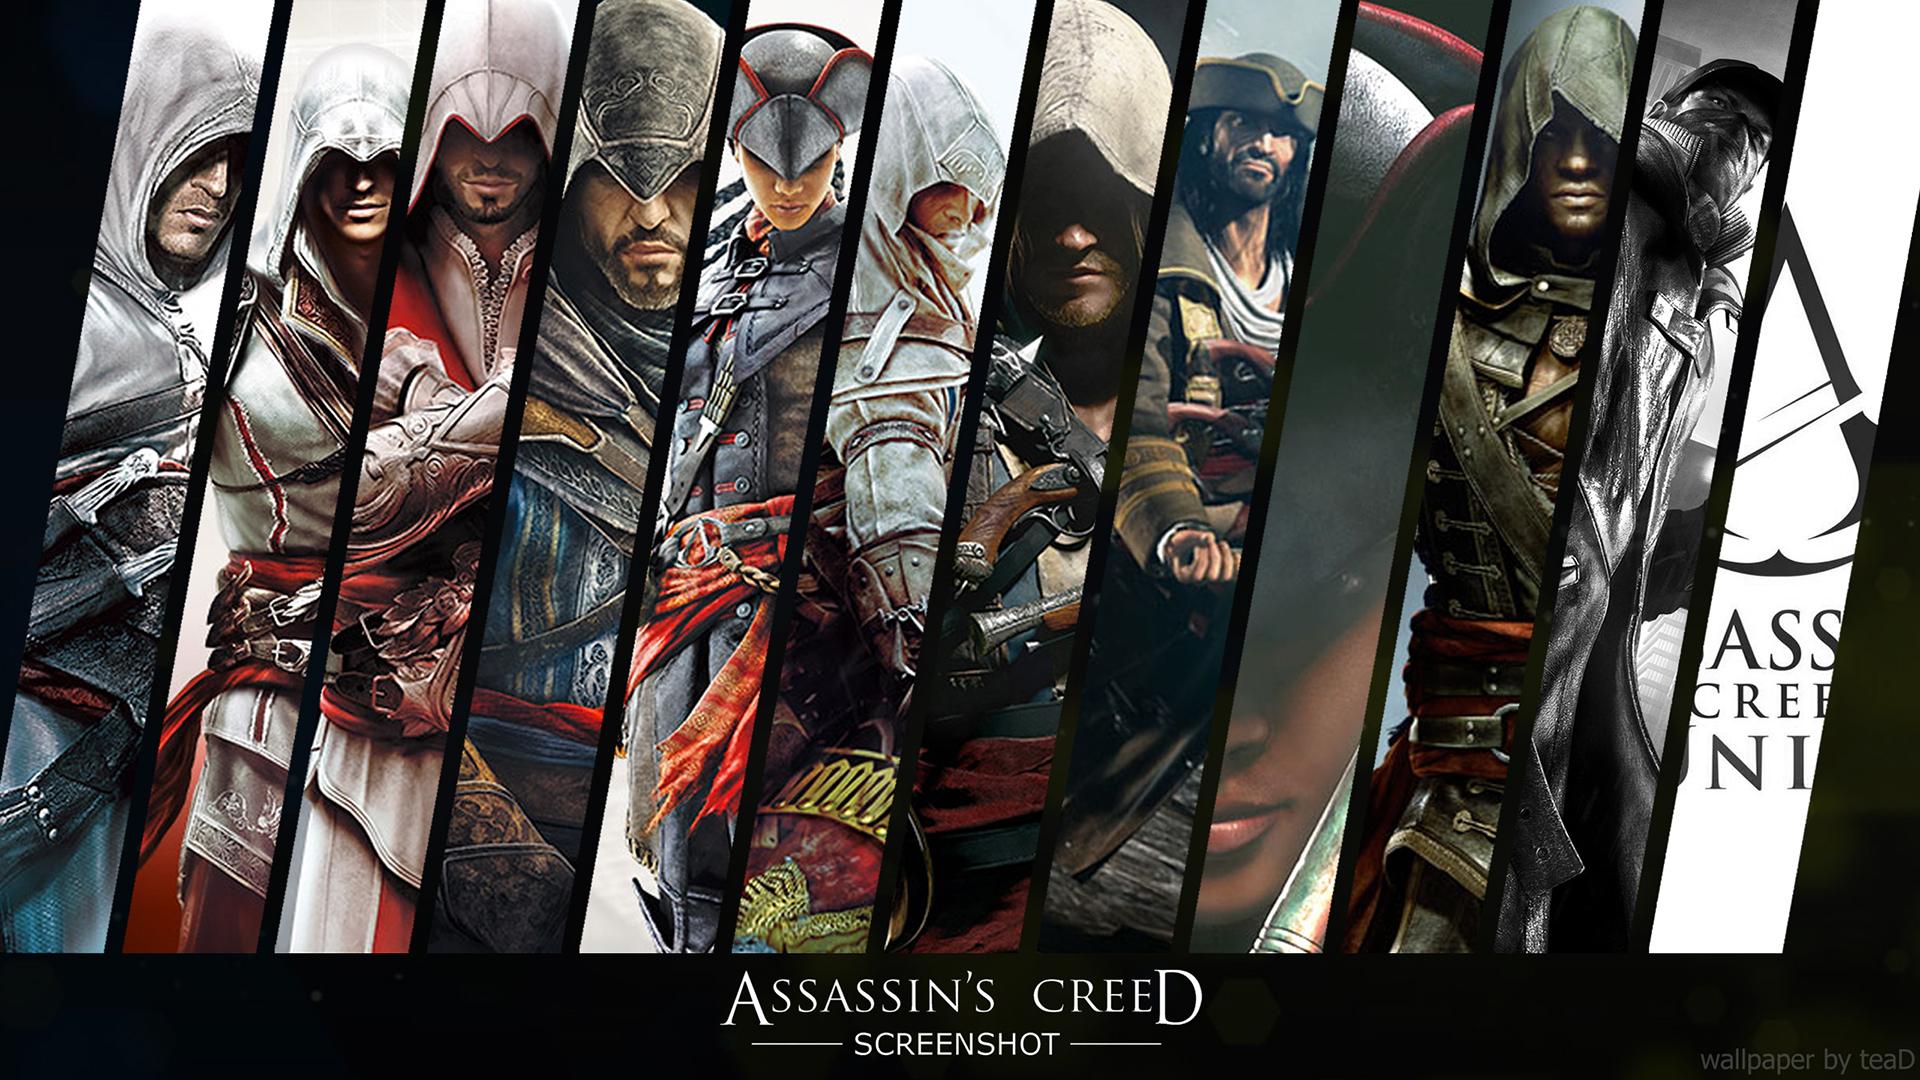 Uncensored scenes in assassin's creed brotherhood erotic image